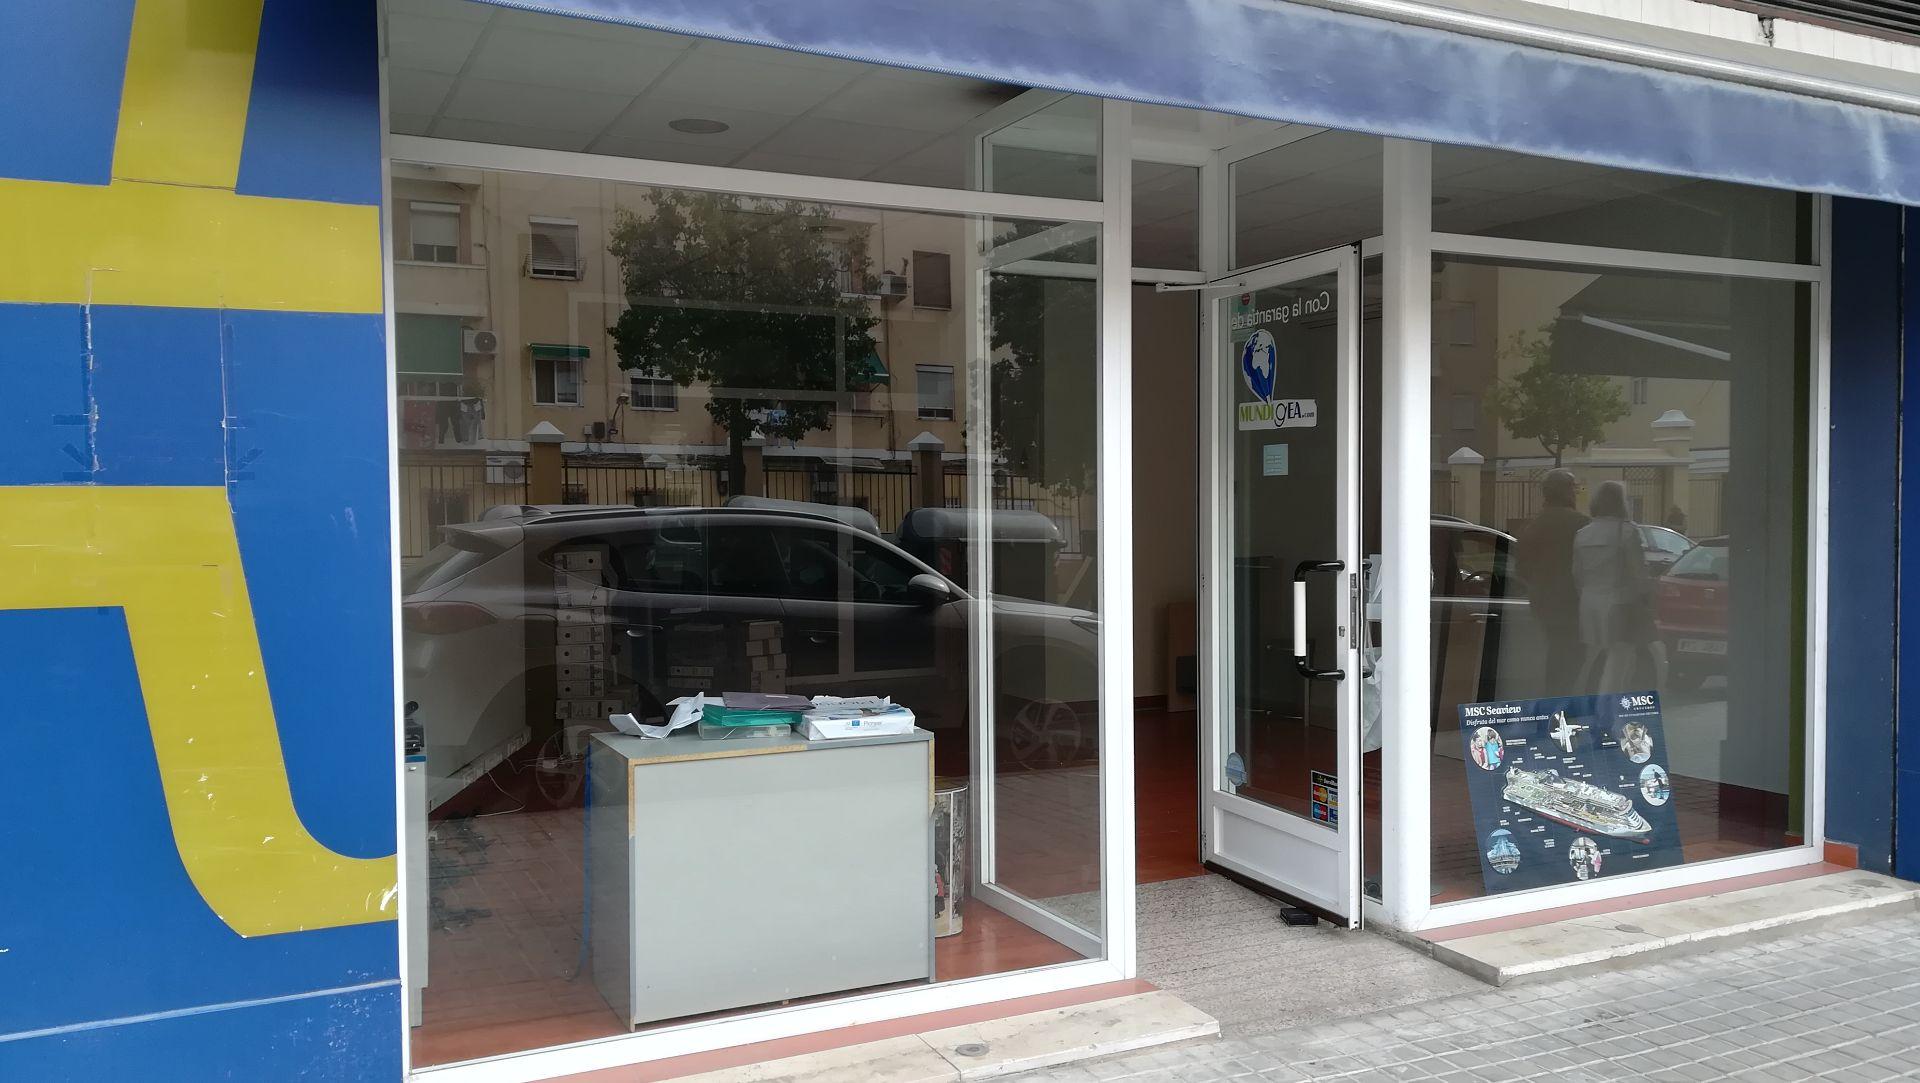 Local comercial en Valencia, alquiler